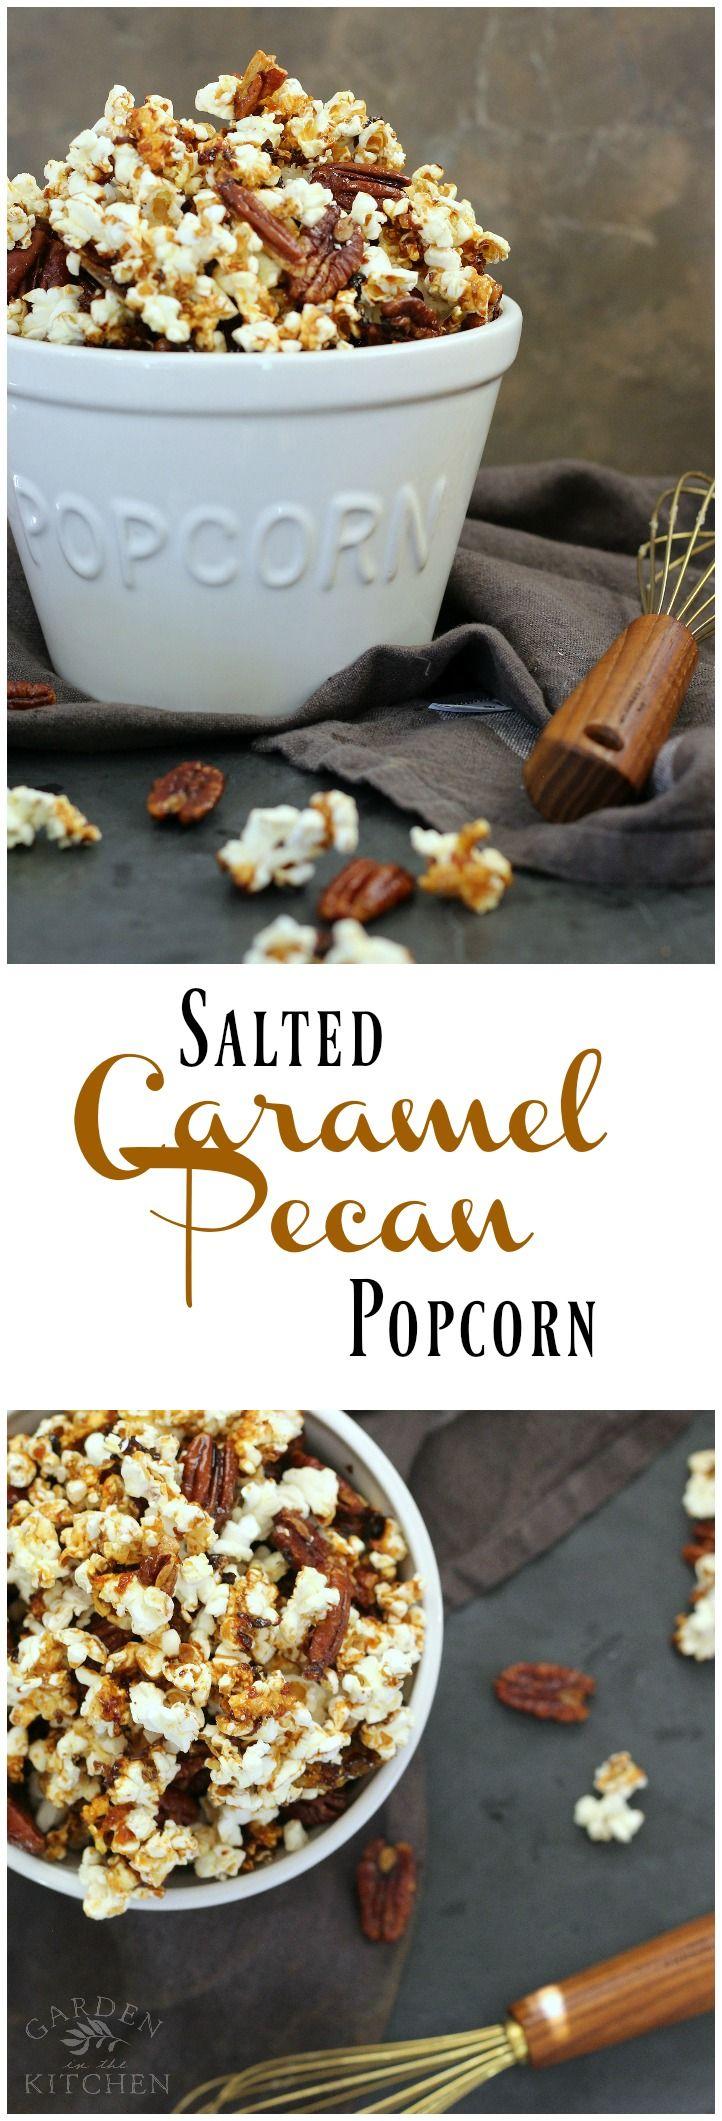 Salted Caramel Pecan Popcorn | gardeninthekitchen.com #popcorn #caramel #fallrecipes #caramelpopcorn